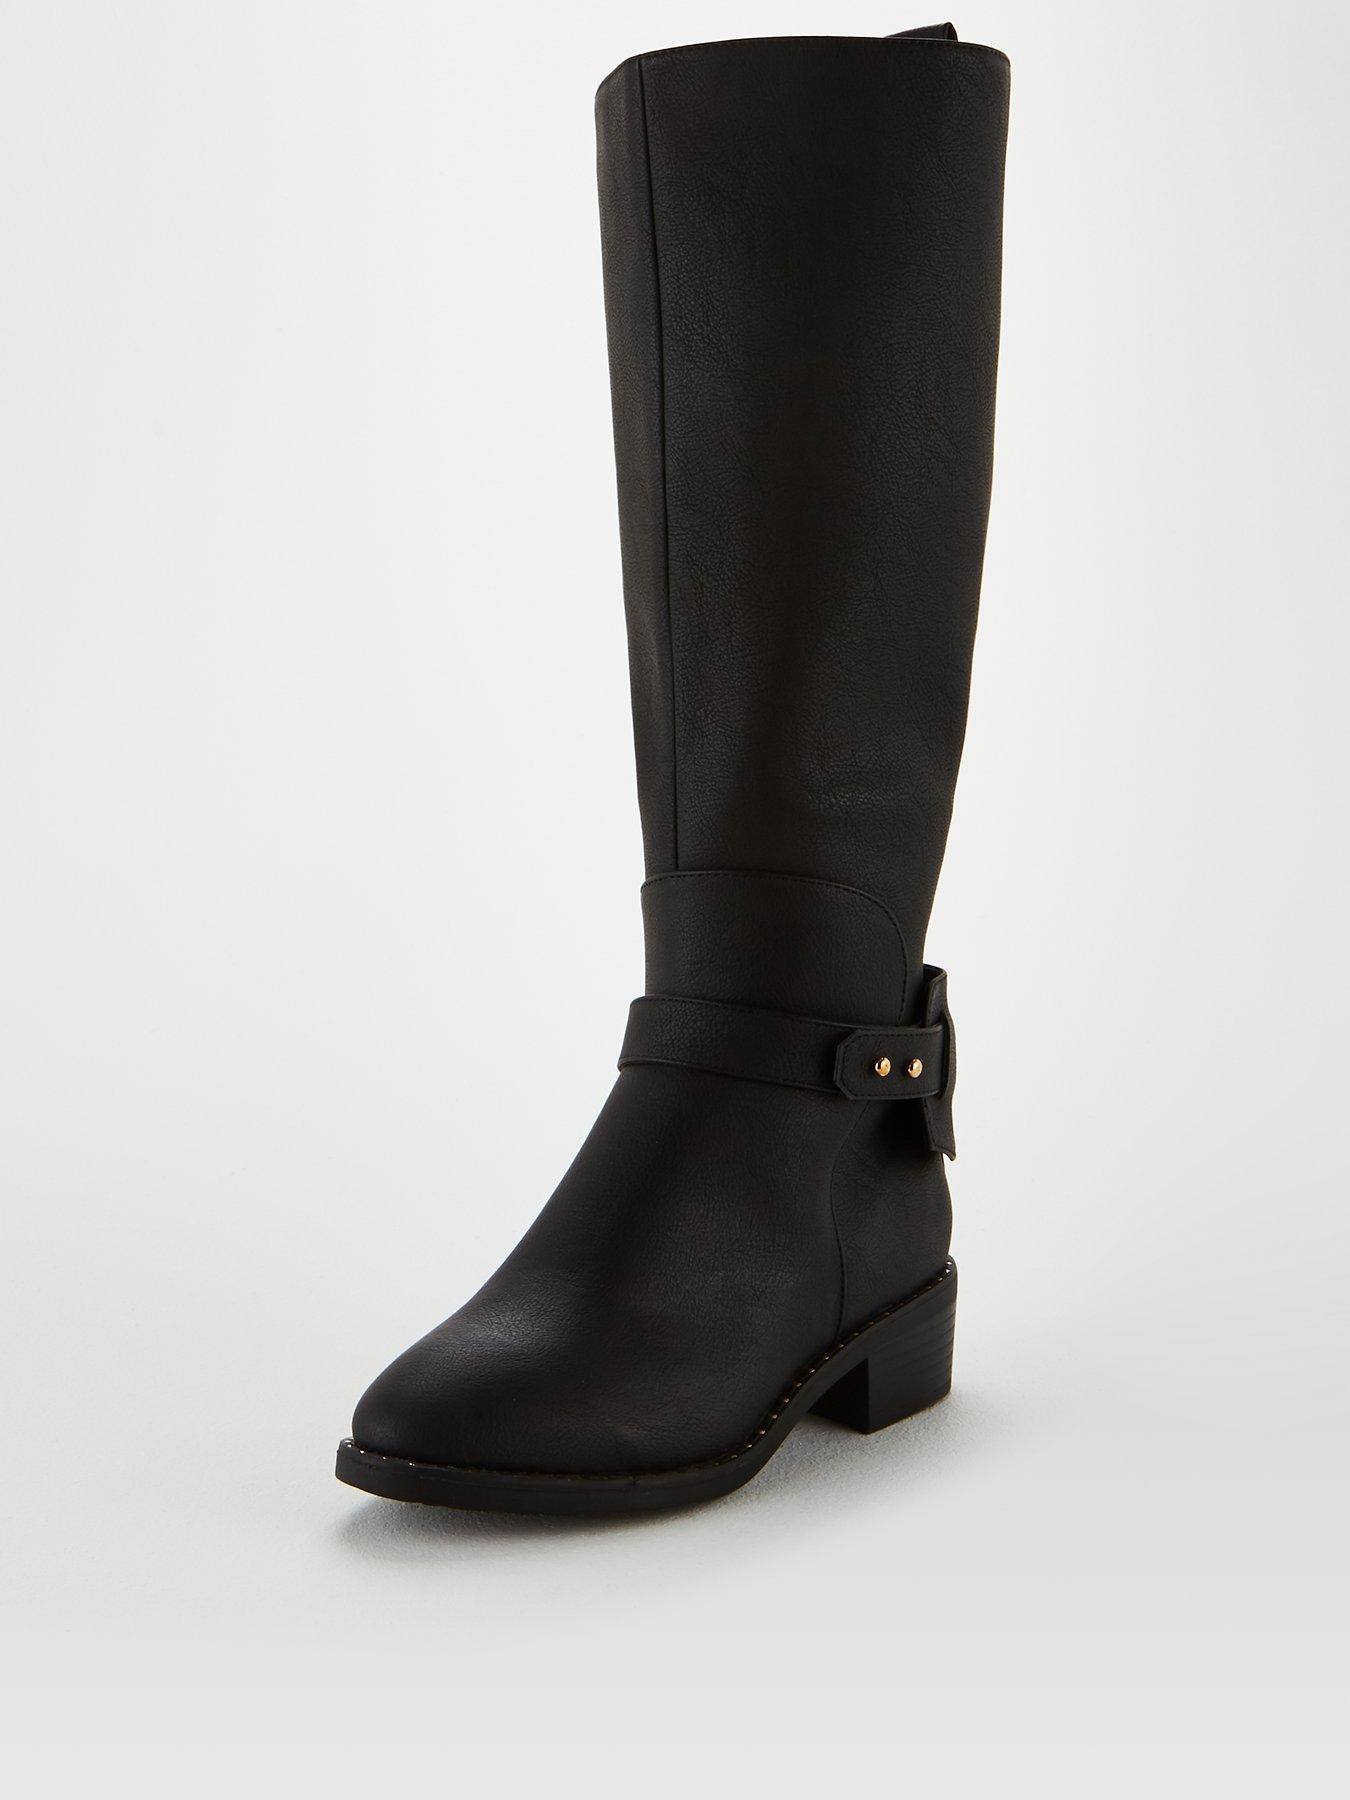 Womens Buckle Strap Round Toe Waterproof Non Slip Chunky Low Heel Zip Up Knee High Boots Zipper